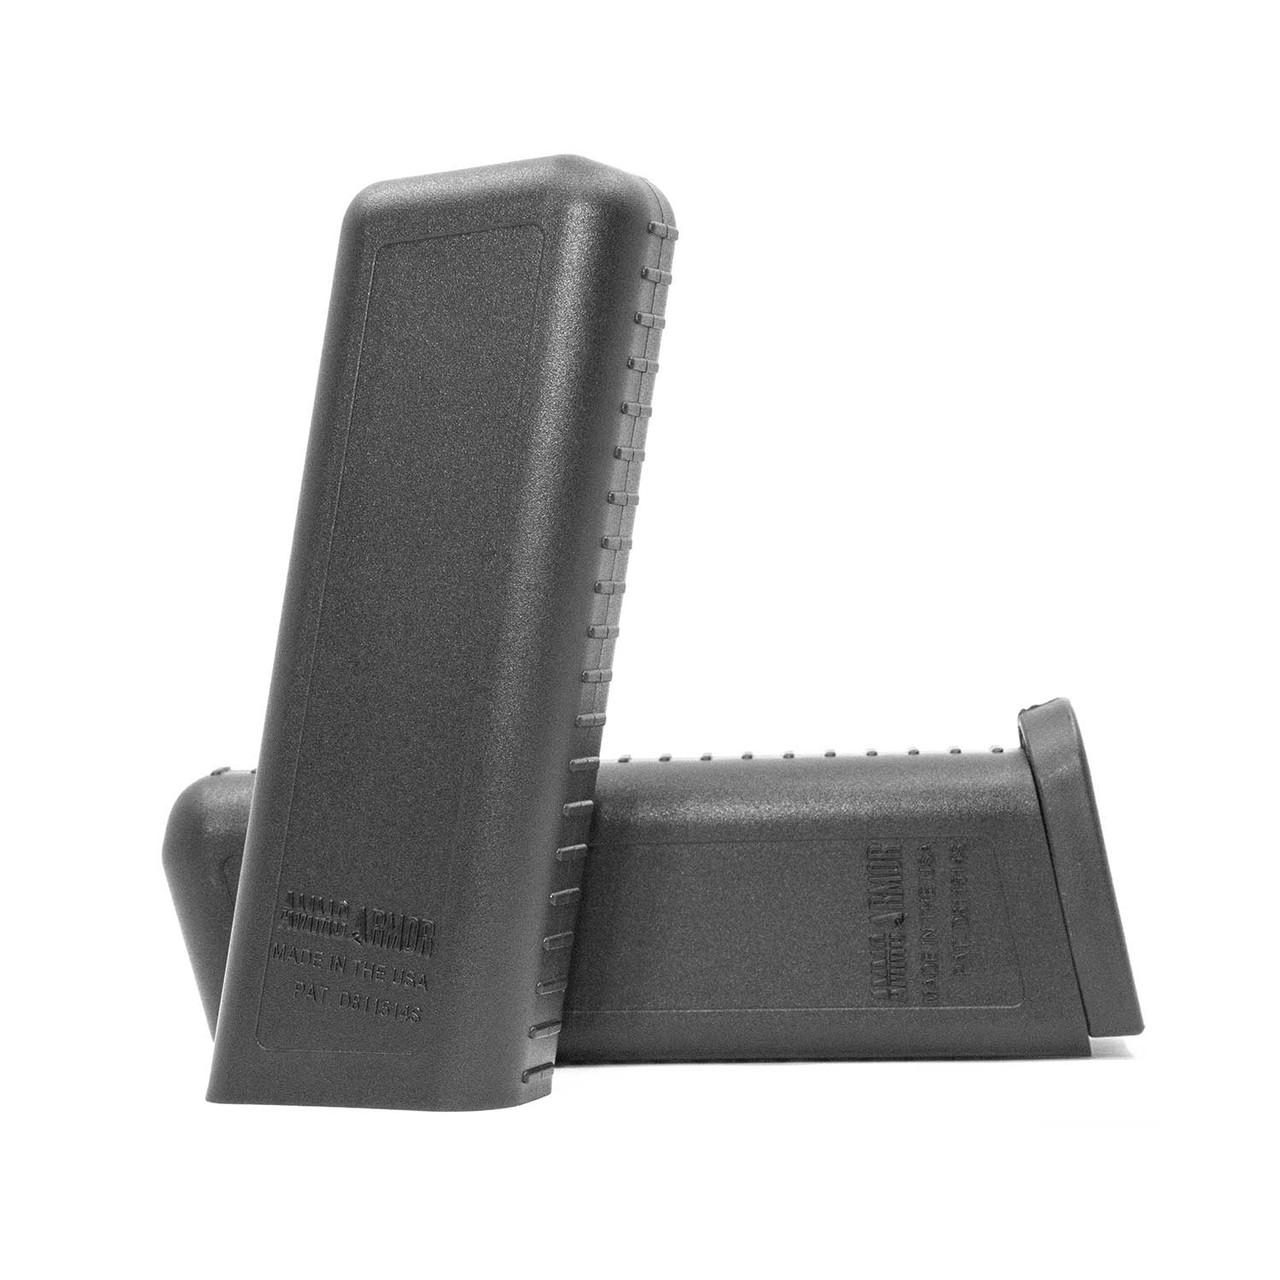 Smith & Wesson M&P Shield 9 EZ Ammo Armor